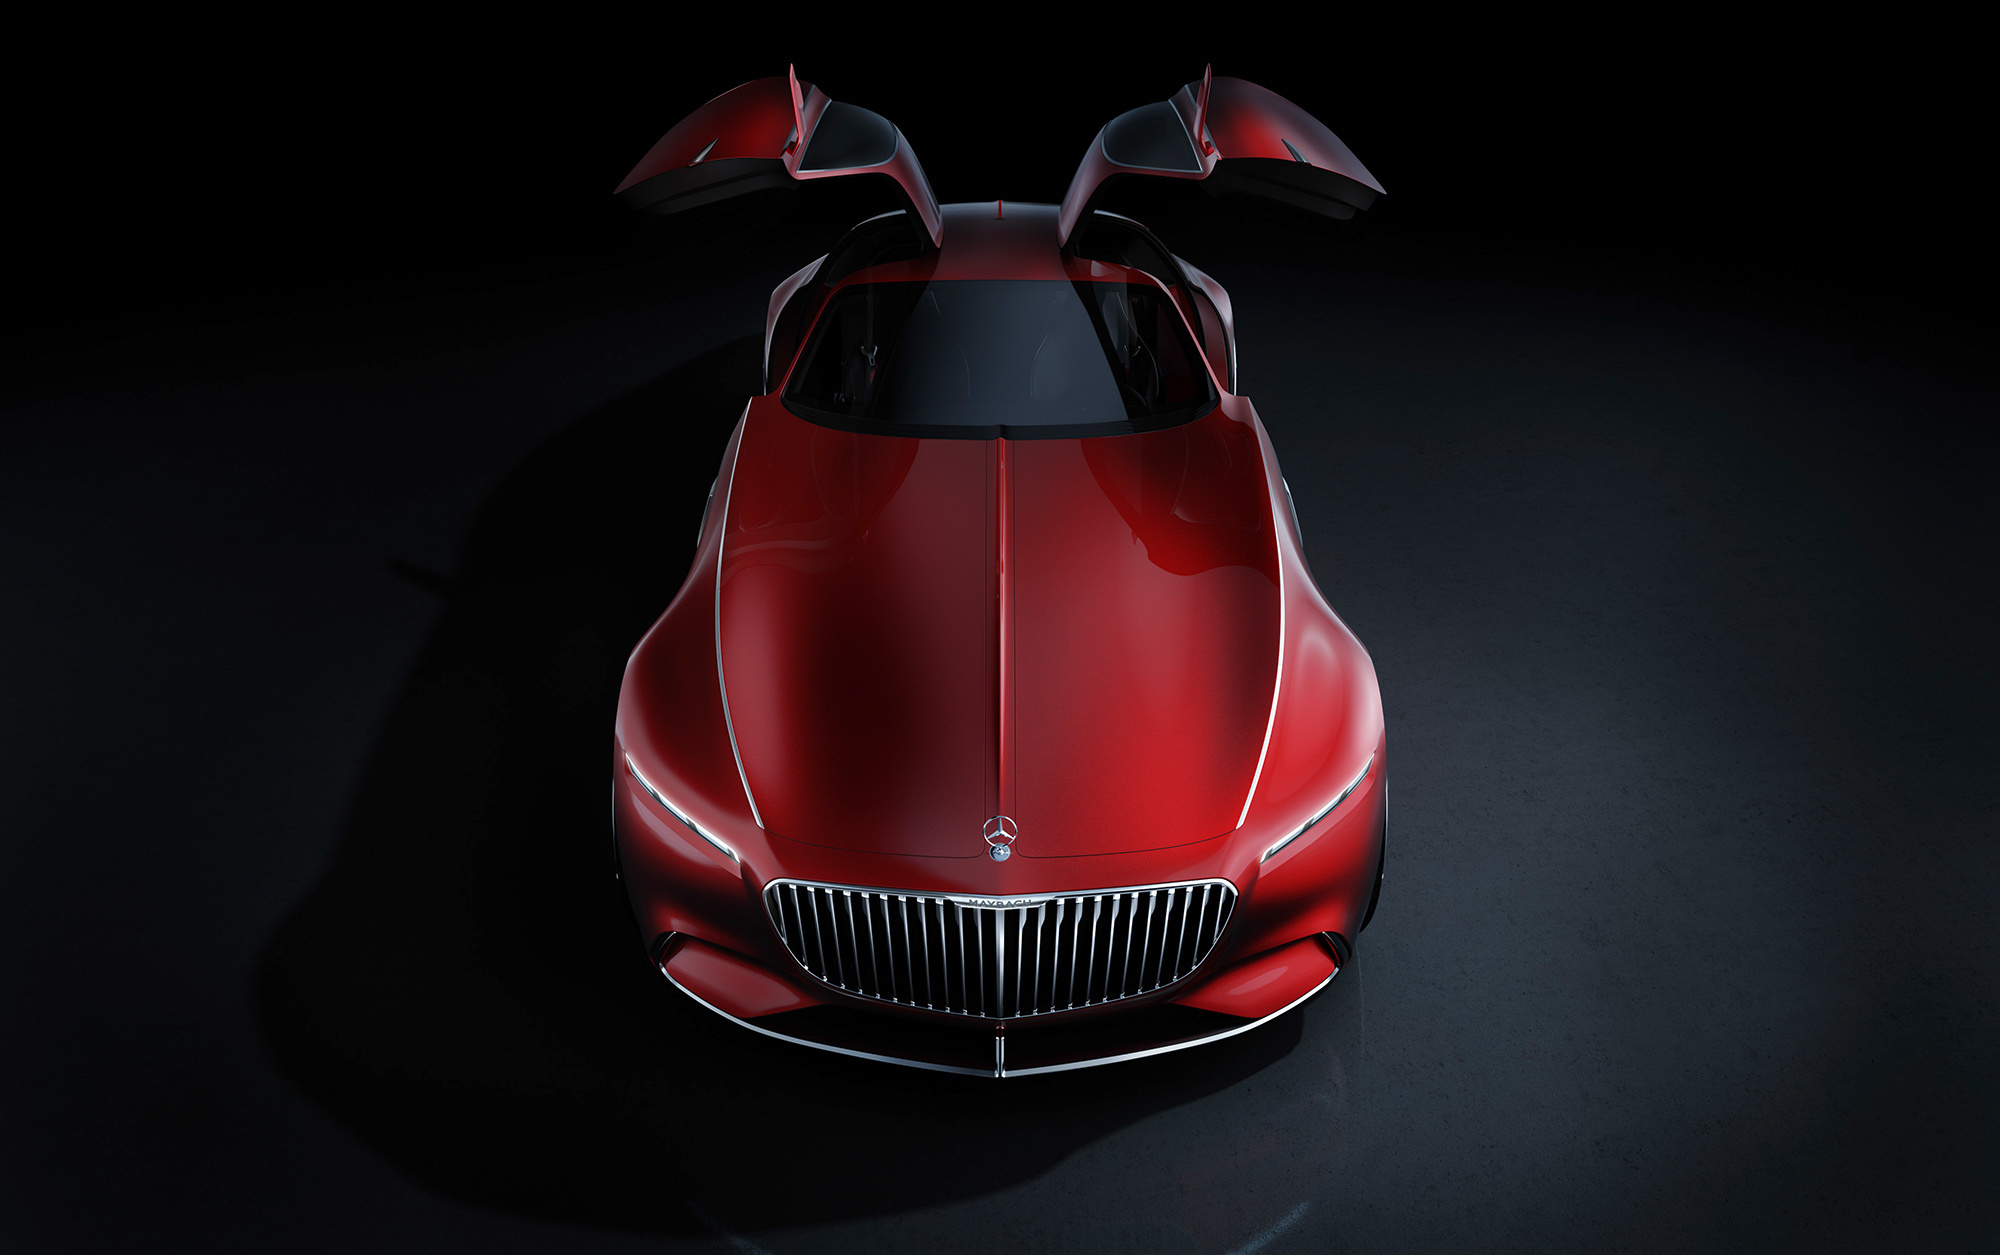 Vision Mercedes Maybach 6 Wallpapers